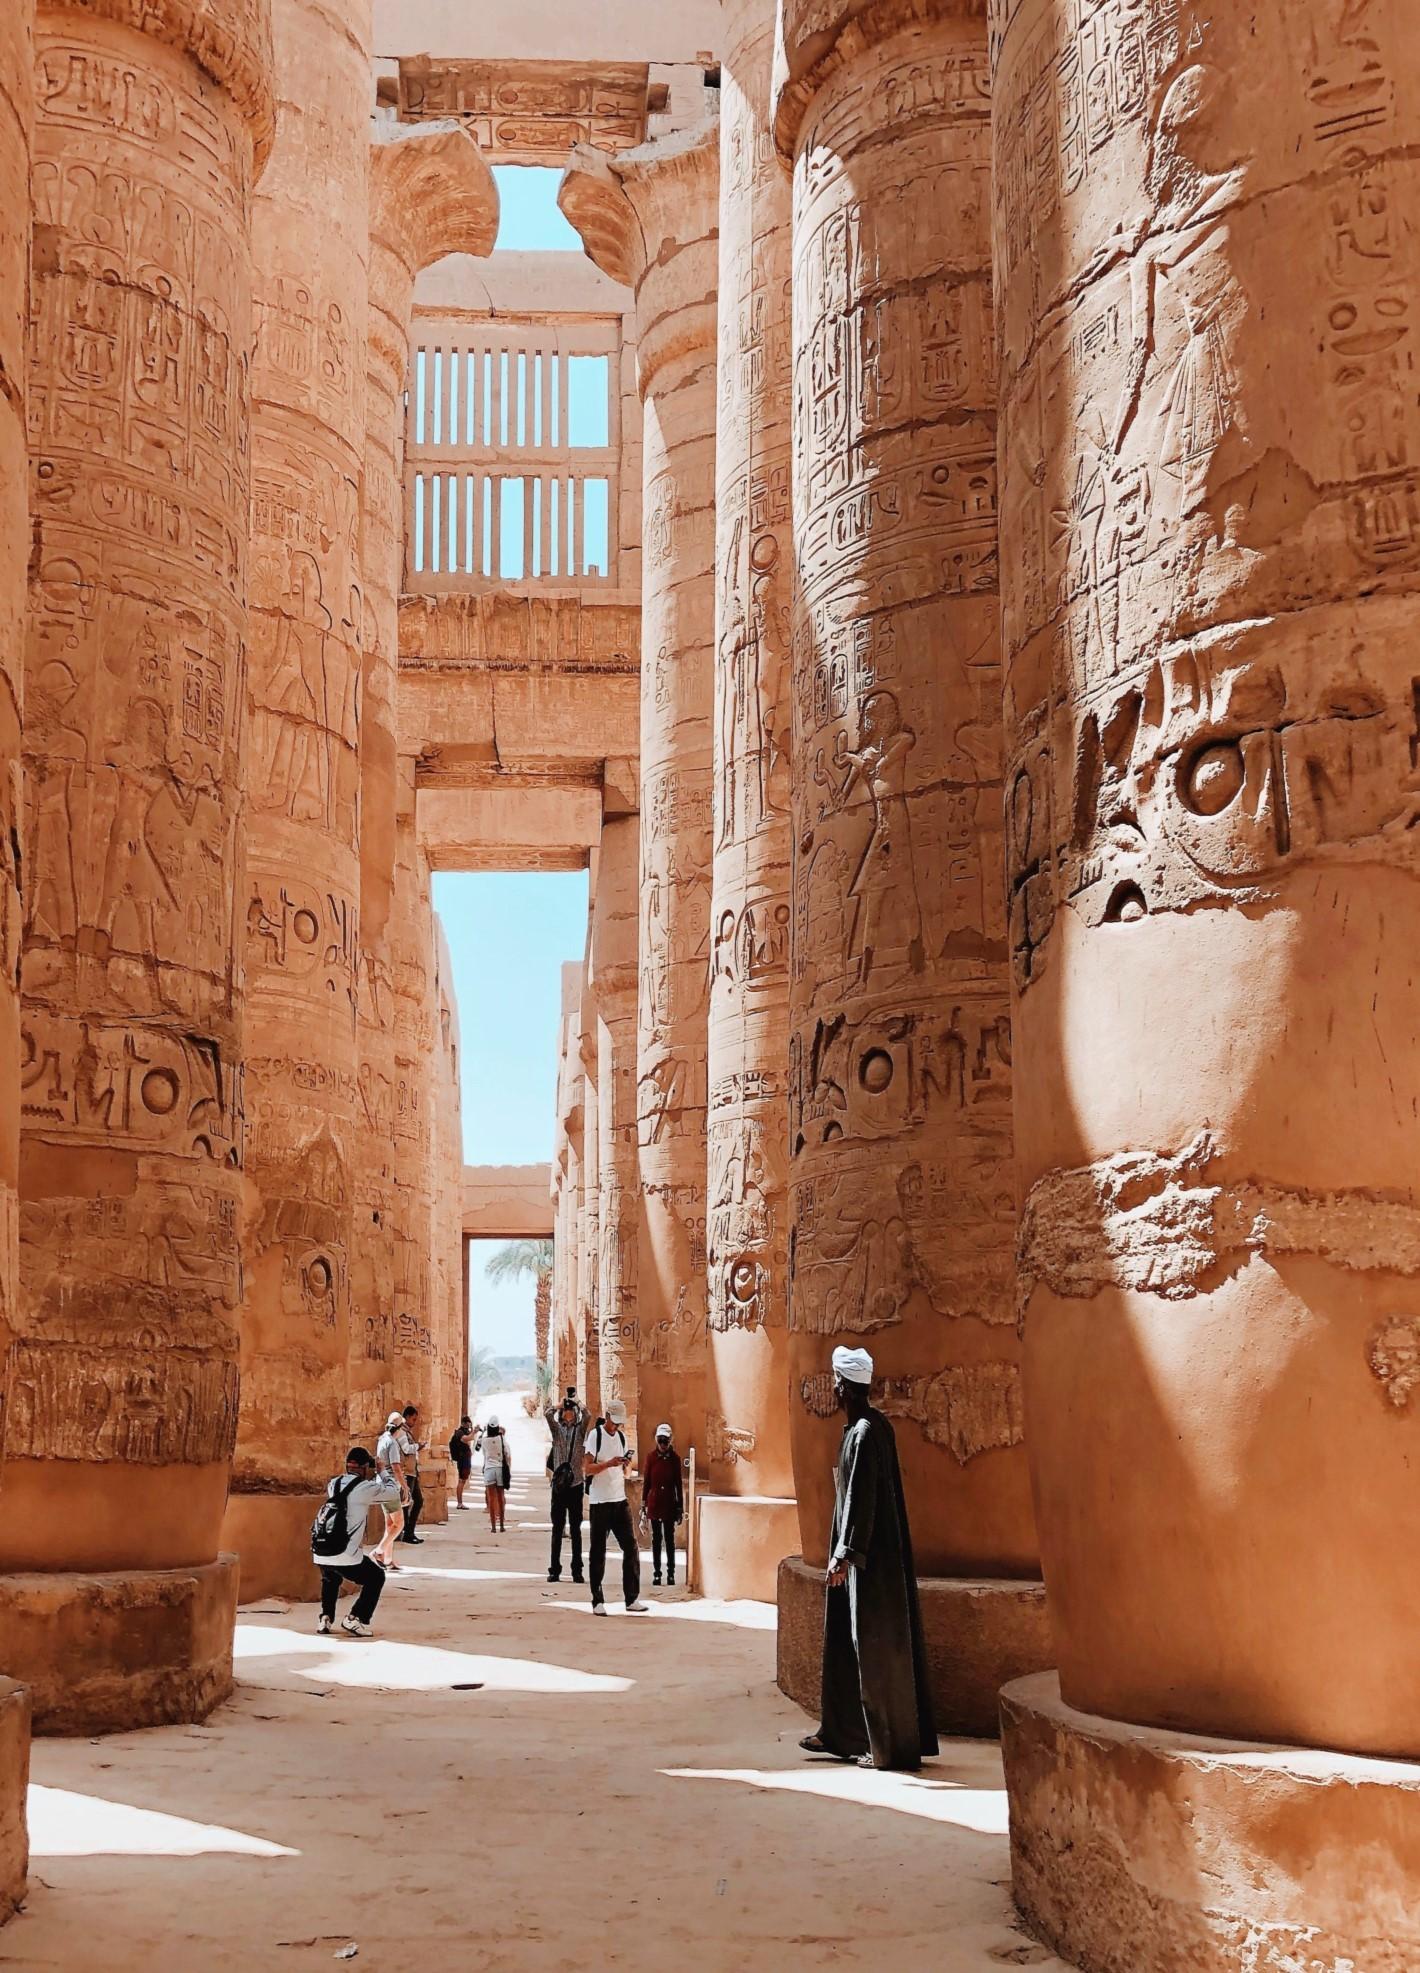 org:image Karnak 1420-1973 Luxor discover Ausflug Marsa Alam